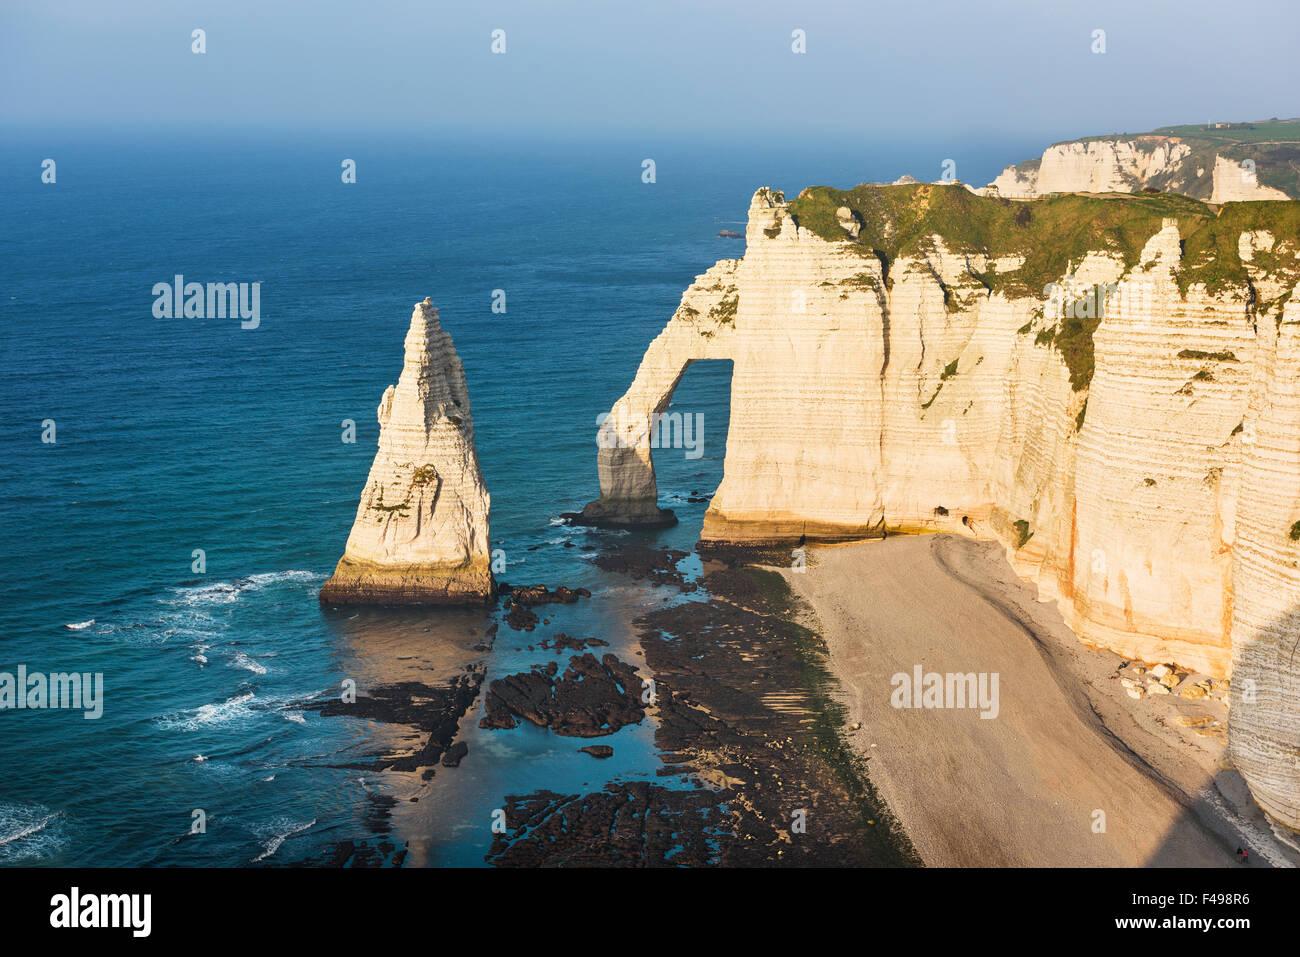 Falaise d'Amont cliff at Etretat, Normandy, France Stock Photo